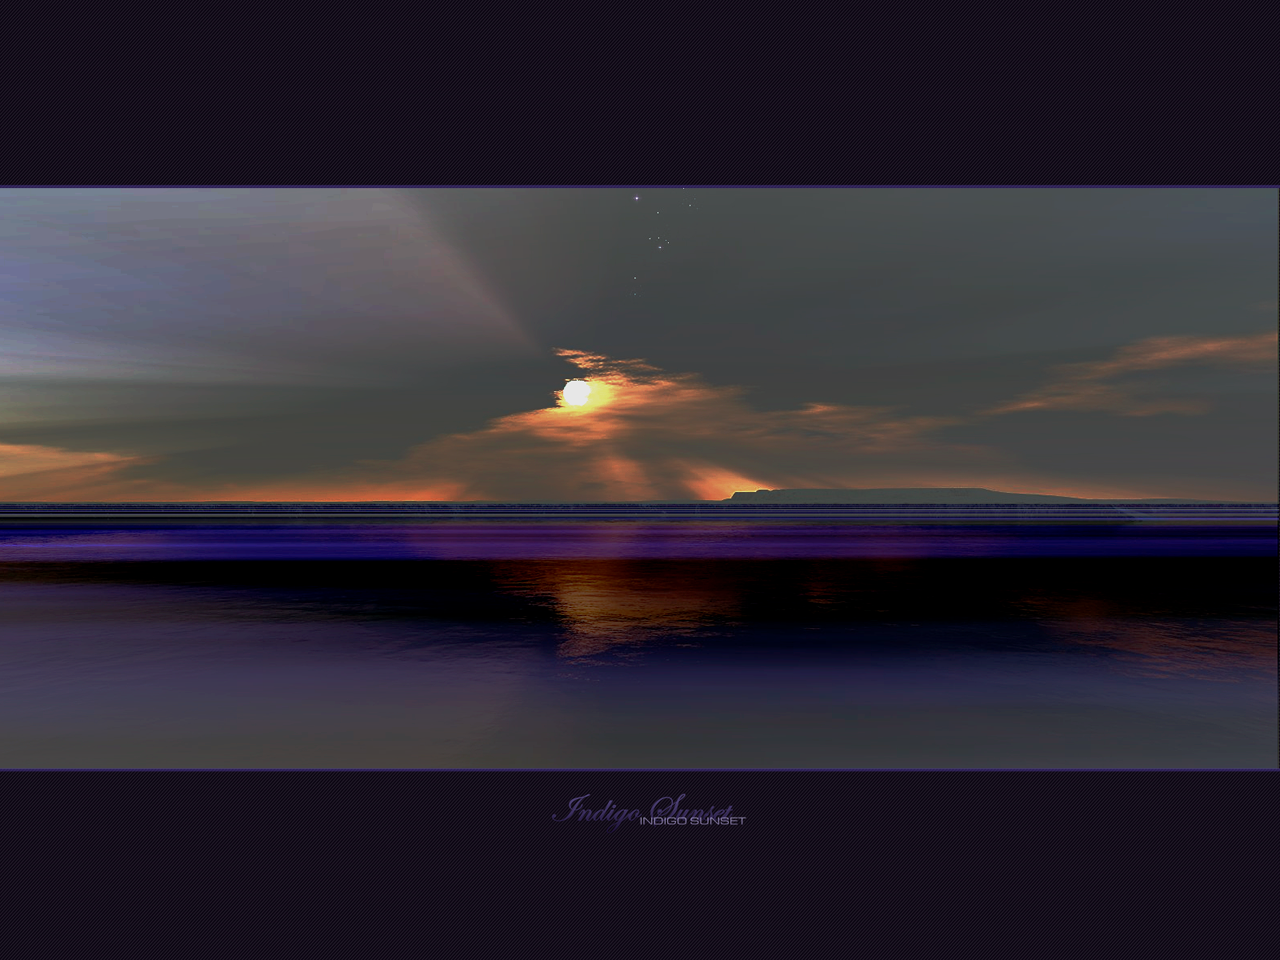 Indigo Sunset by etype2